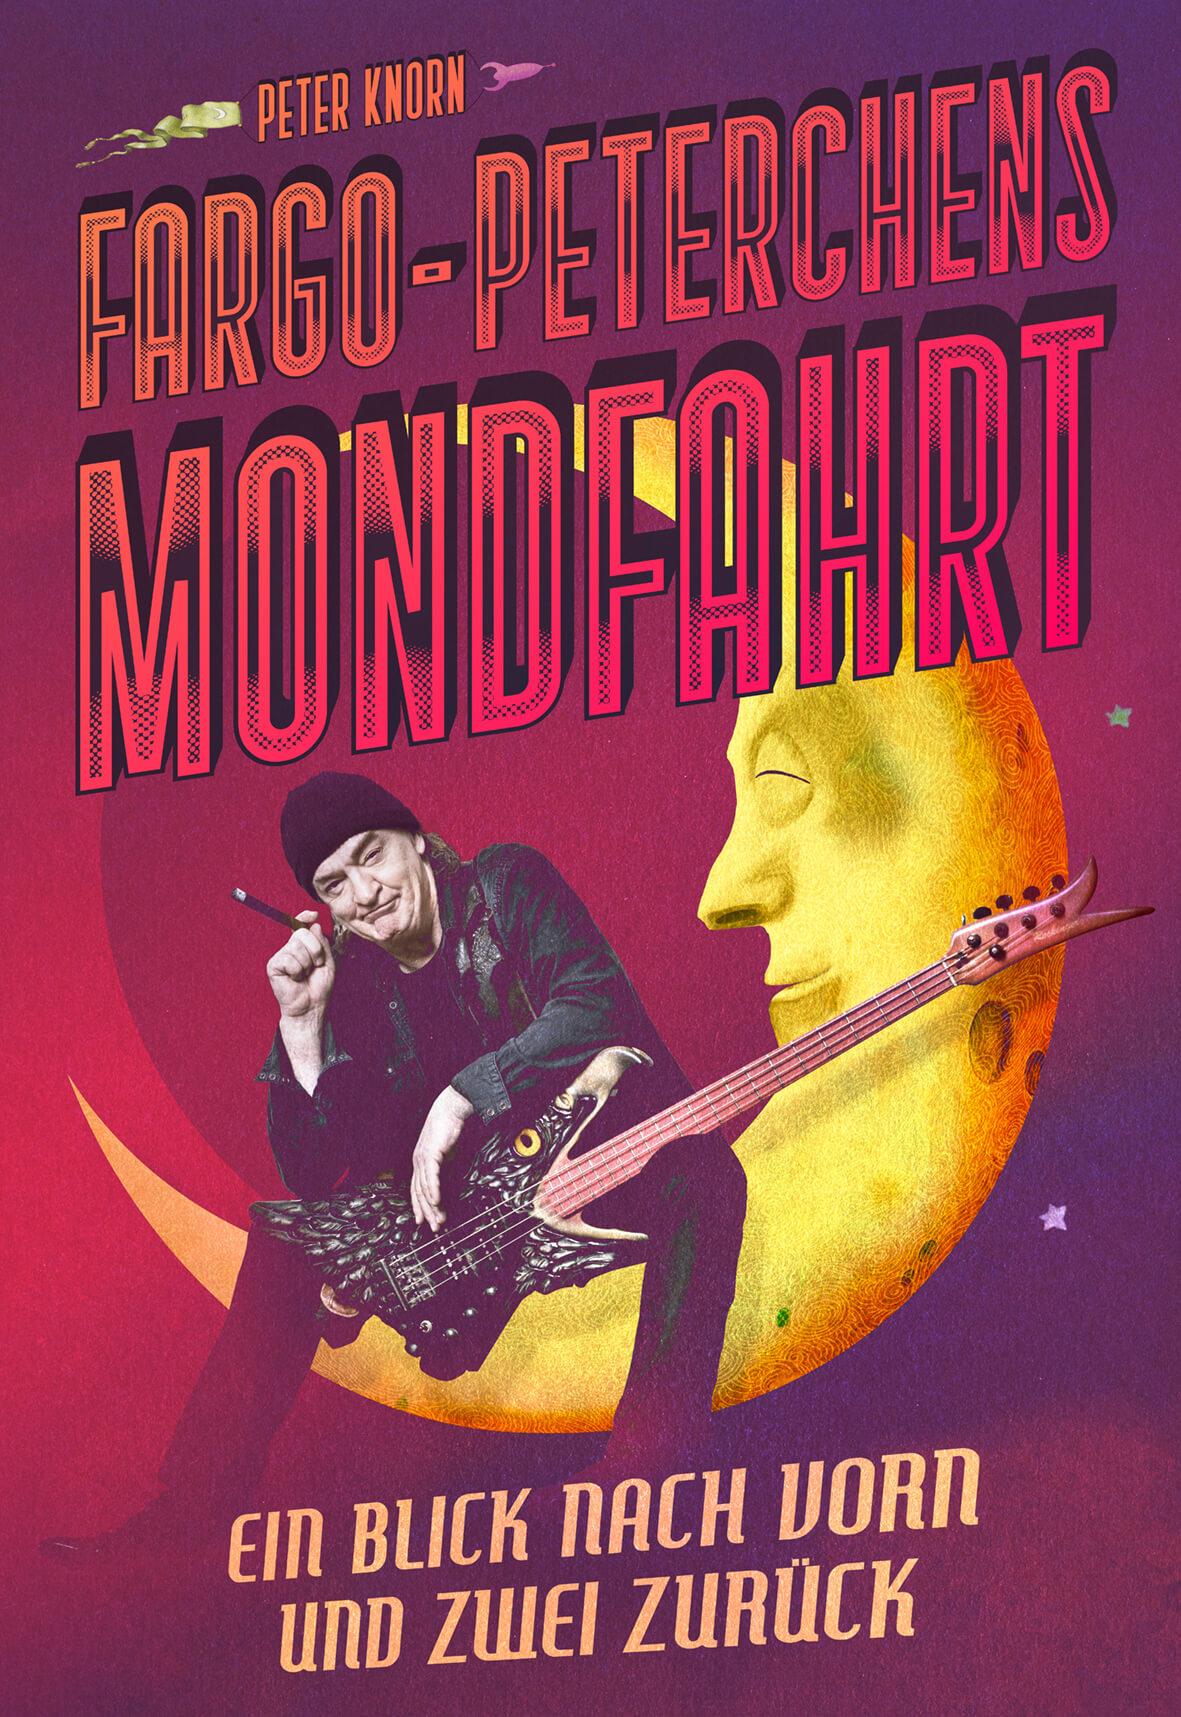 Knorn_Fargo-PeterchensMondfahrt_Cover_web